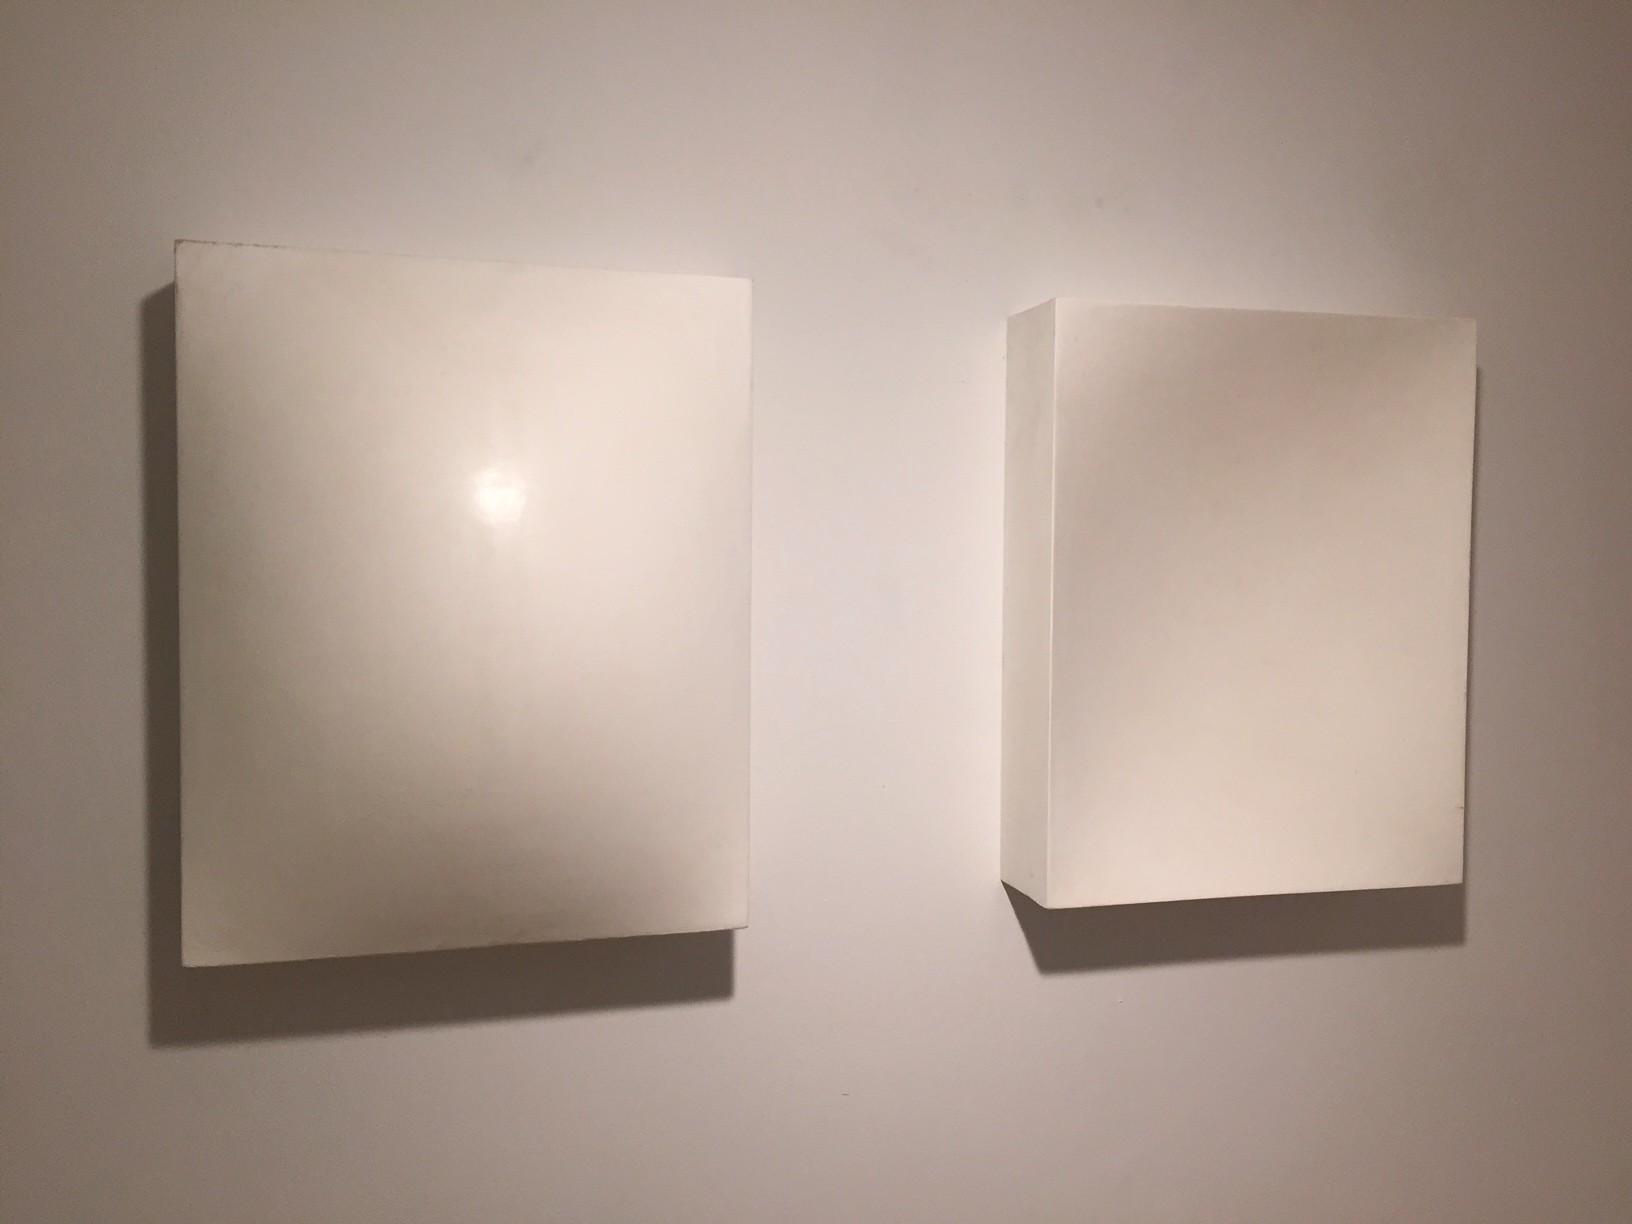 Mats Bergquist, Rest, Galleria San Fedele Arte, Milano